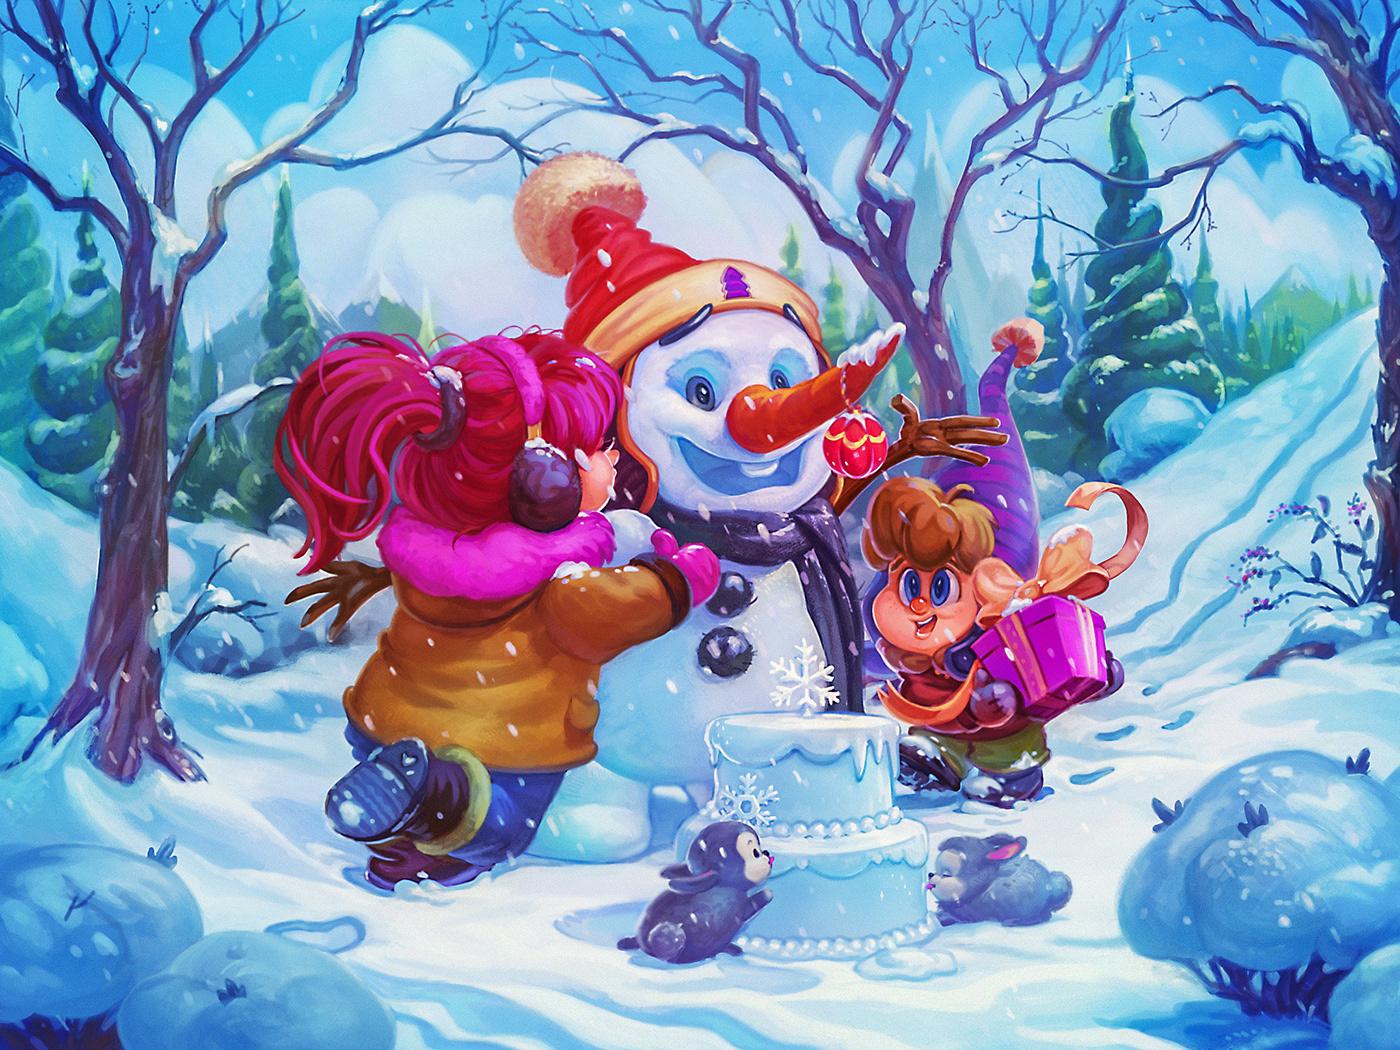 snowman kids children Birthday cartoon party winter Christmas story snow